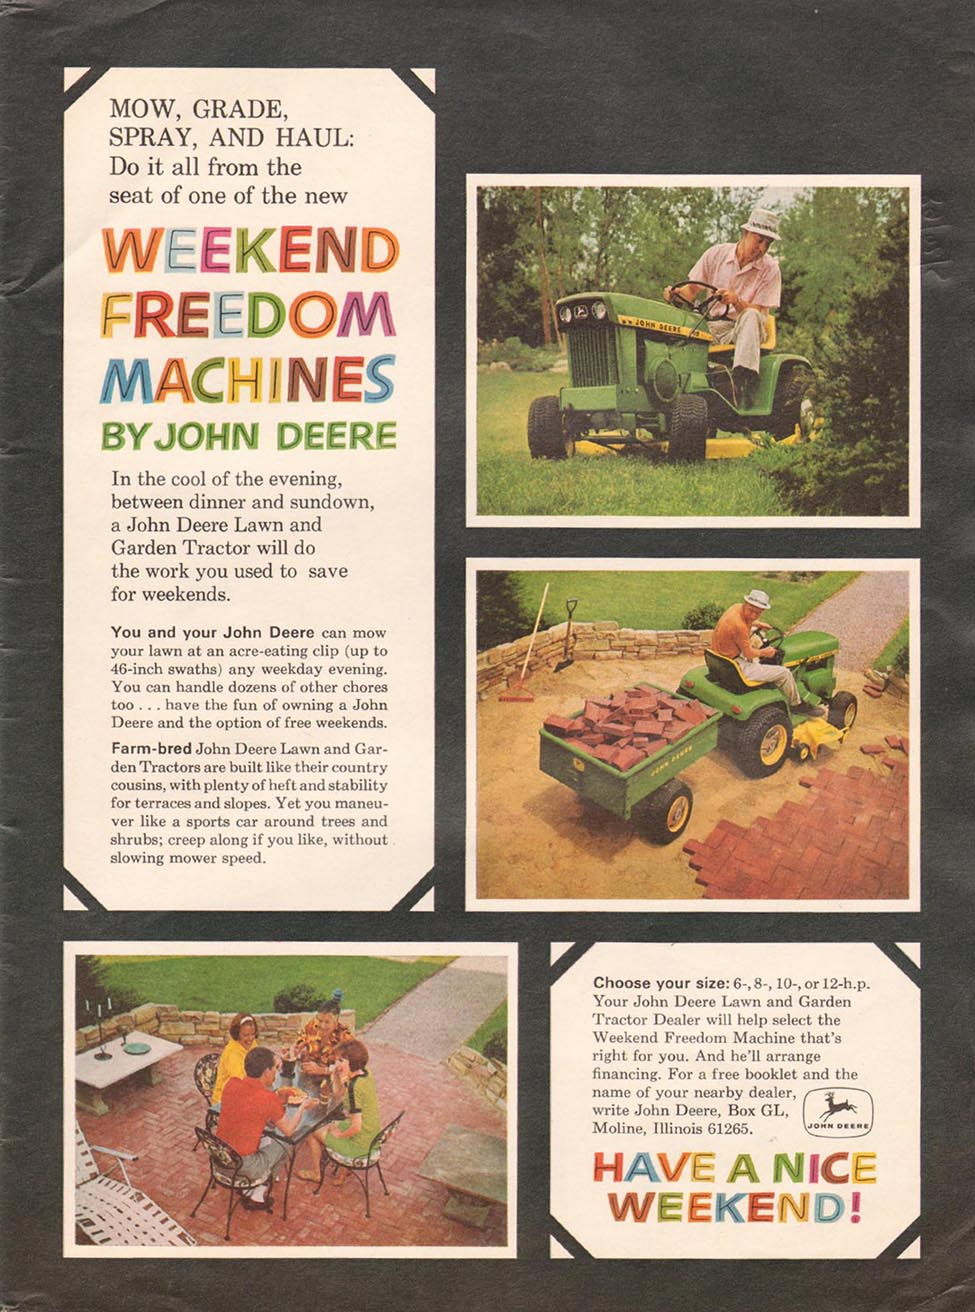 JOHN DEERE LAWN AND GARDEN TRACTOR NEWSWEEK 05/20/1968